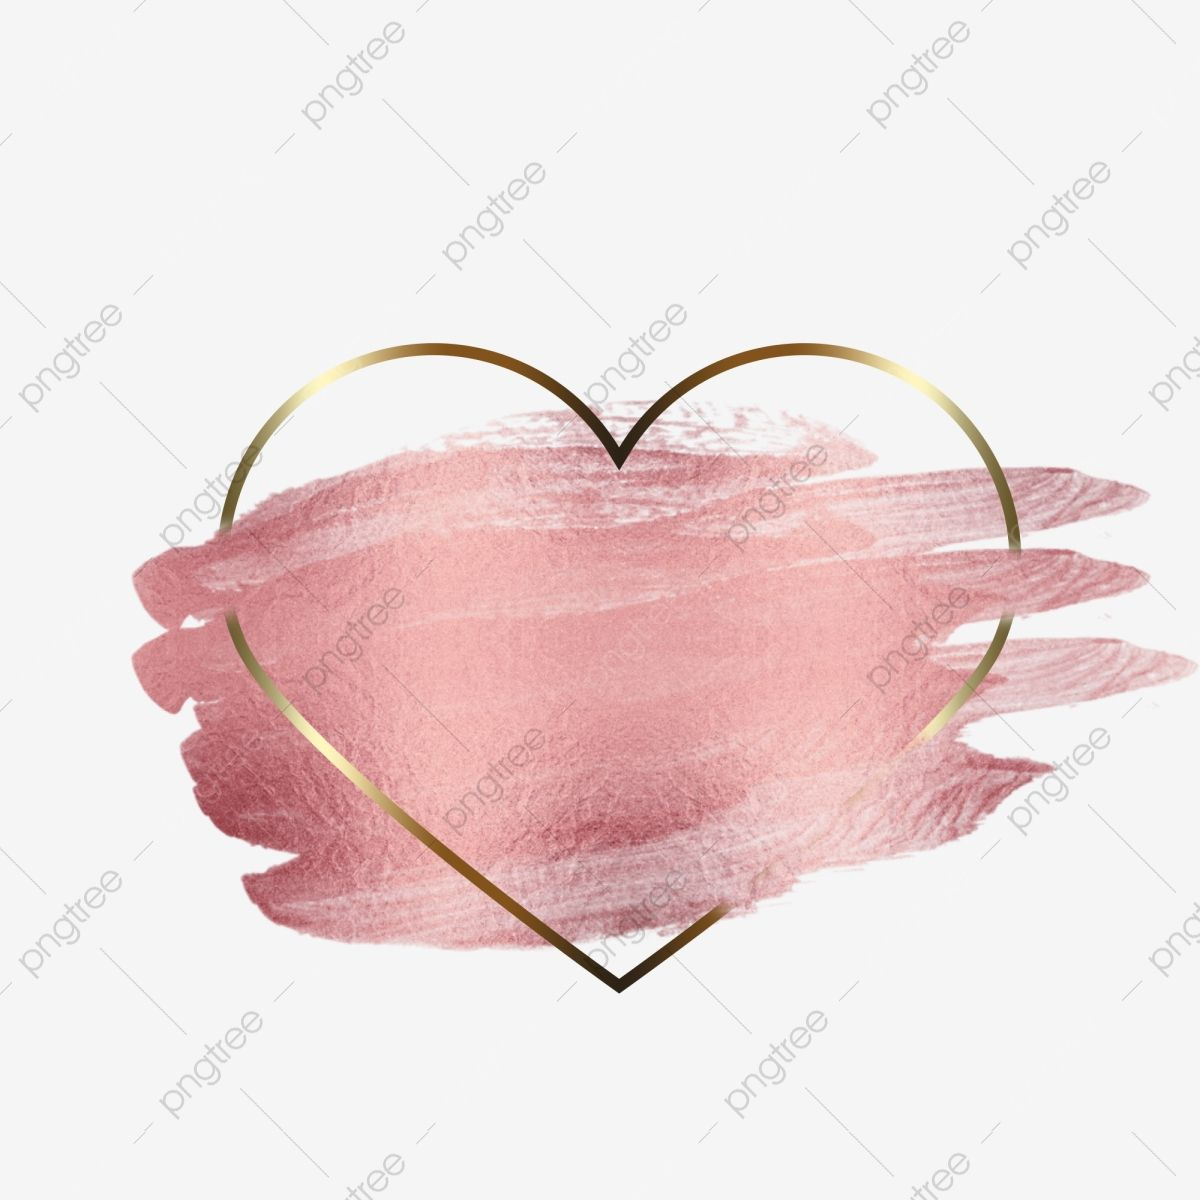 Corazon Girasol Frontera En Forma De Corazon Marco Girasol Png Y Psd Para Descargar Gratis Pngtree Pink Abstract Painting Pink Abstract Flower Frame